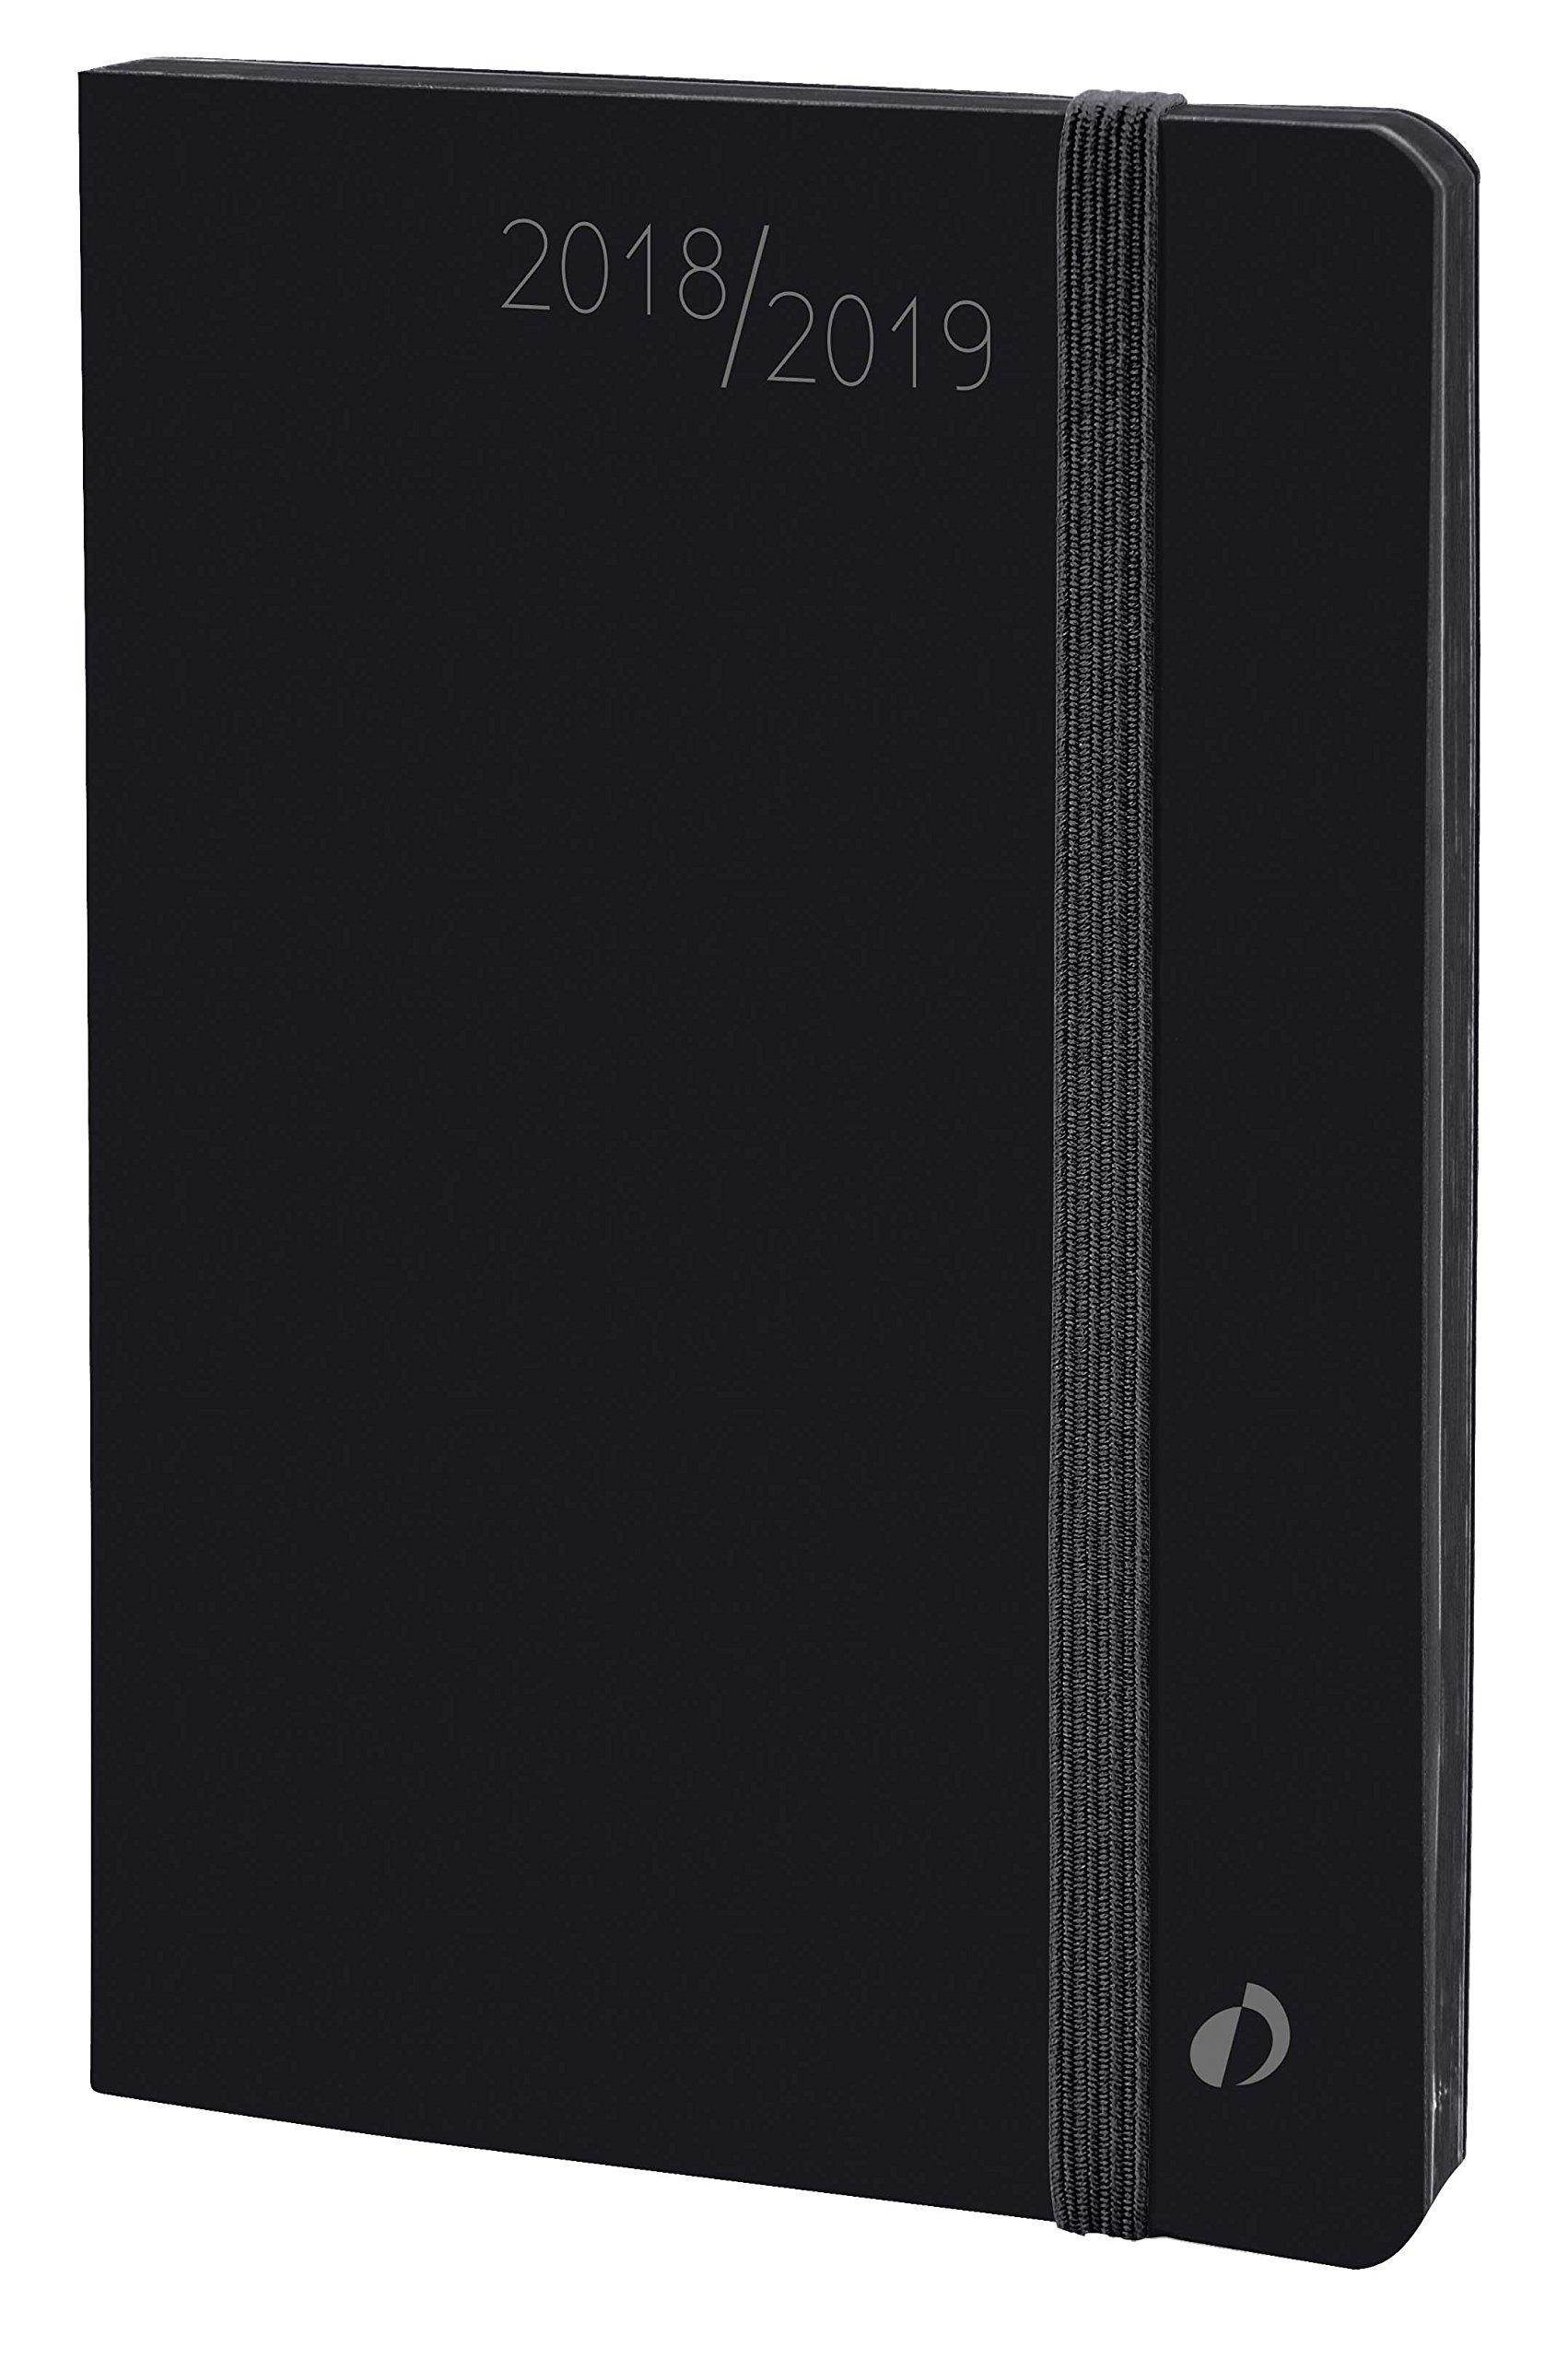 Quo Vadis Horizontal Velvet 15 SD September to December 549008q Academic Diary Year Diary with Elastic 10 x 15 cm 2017-2018 - Velvet Black by Quo Vadis (Image #1)